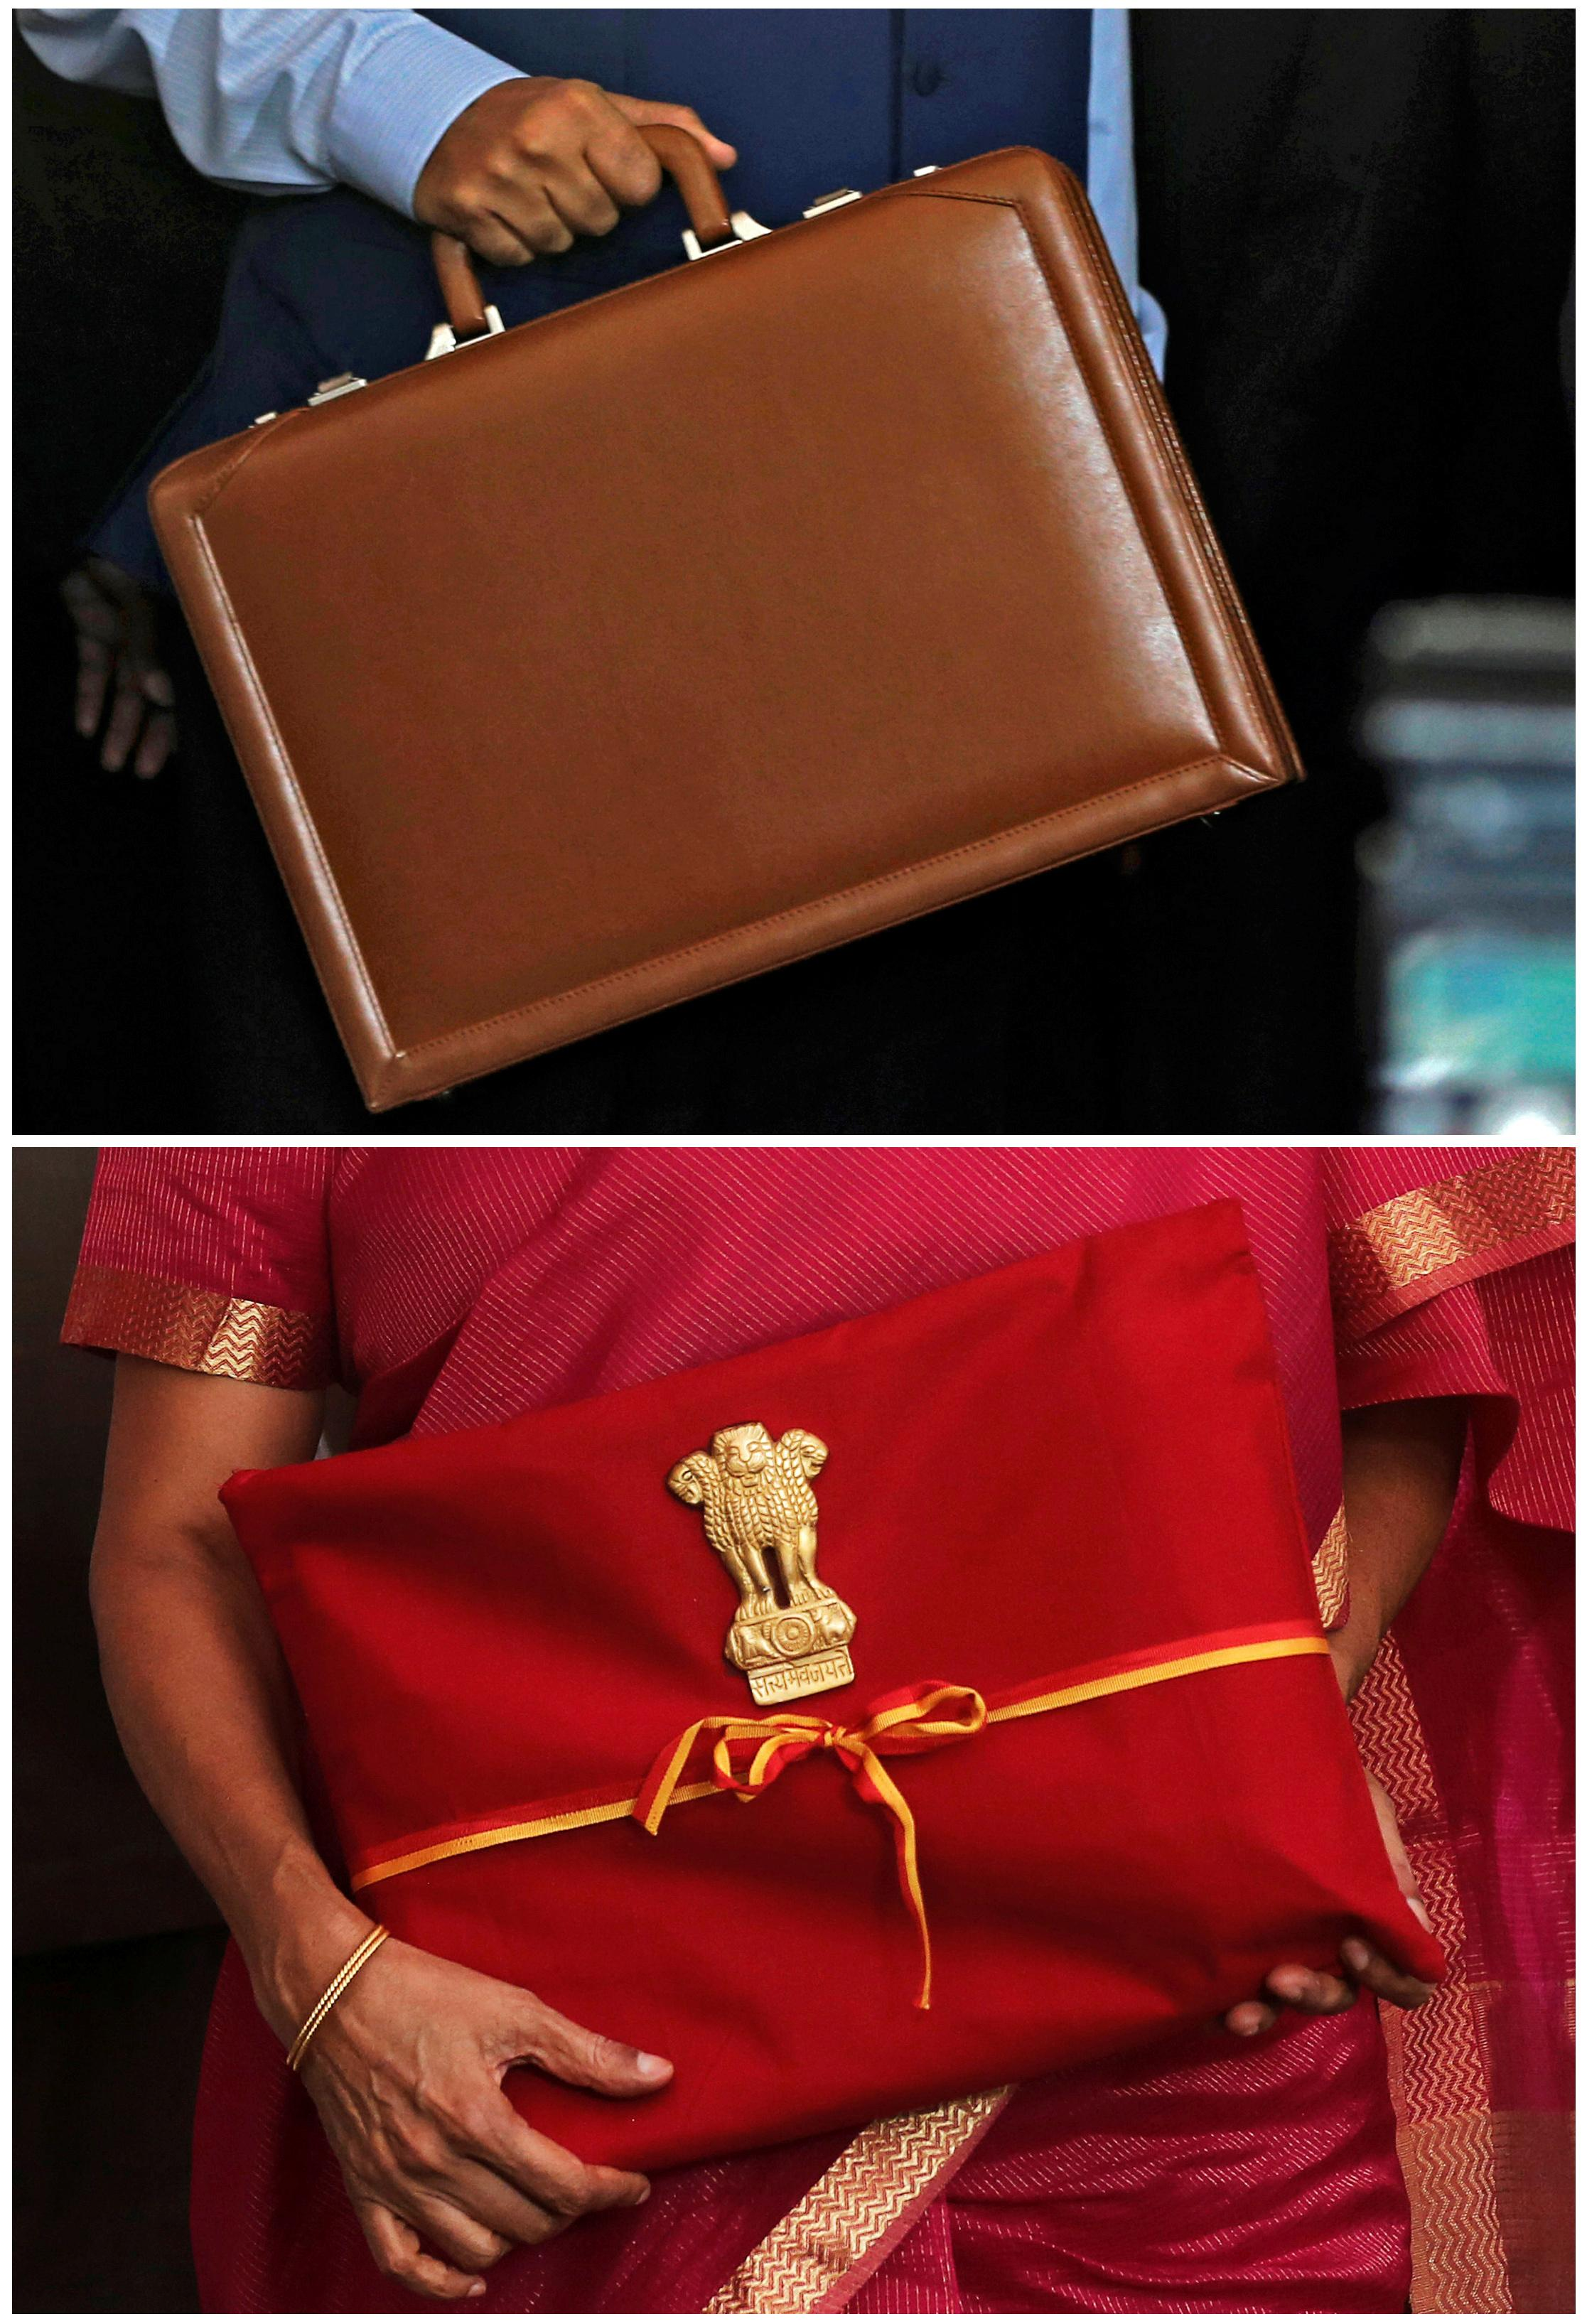 India raises import tariffs, taxes on the super rich as it seeks